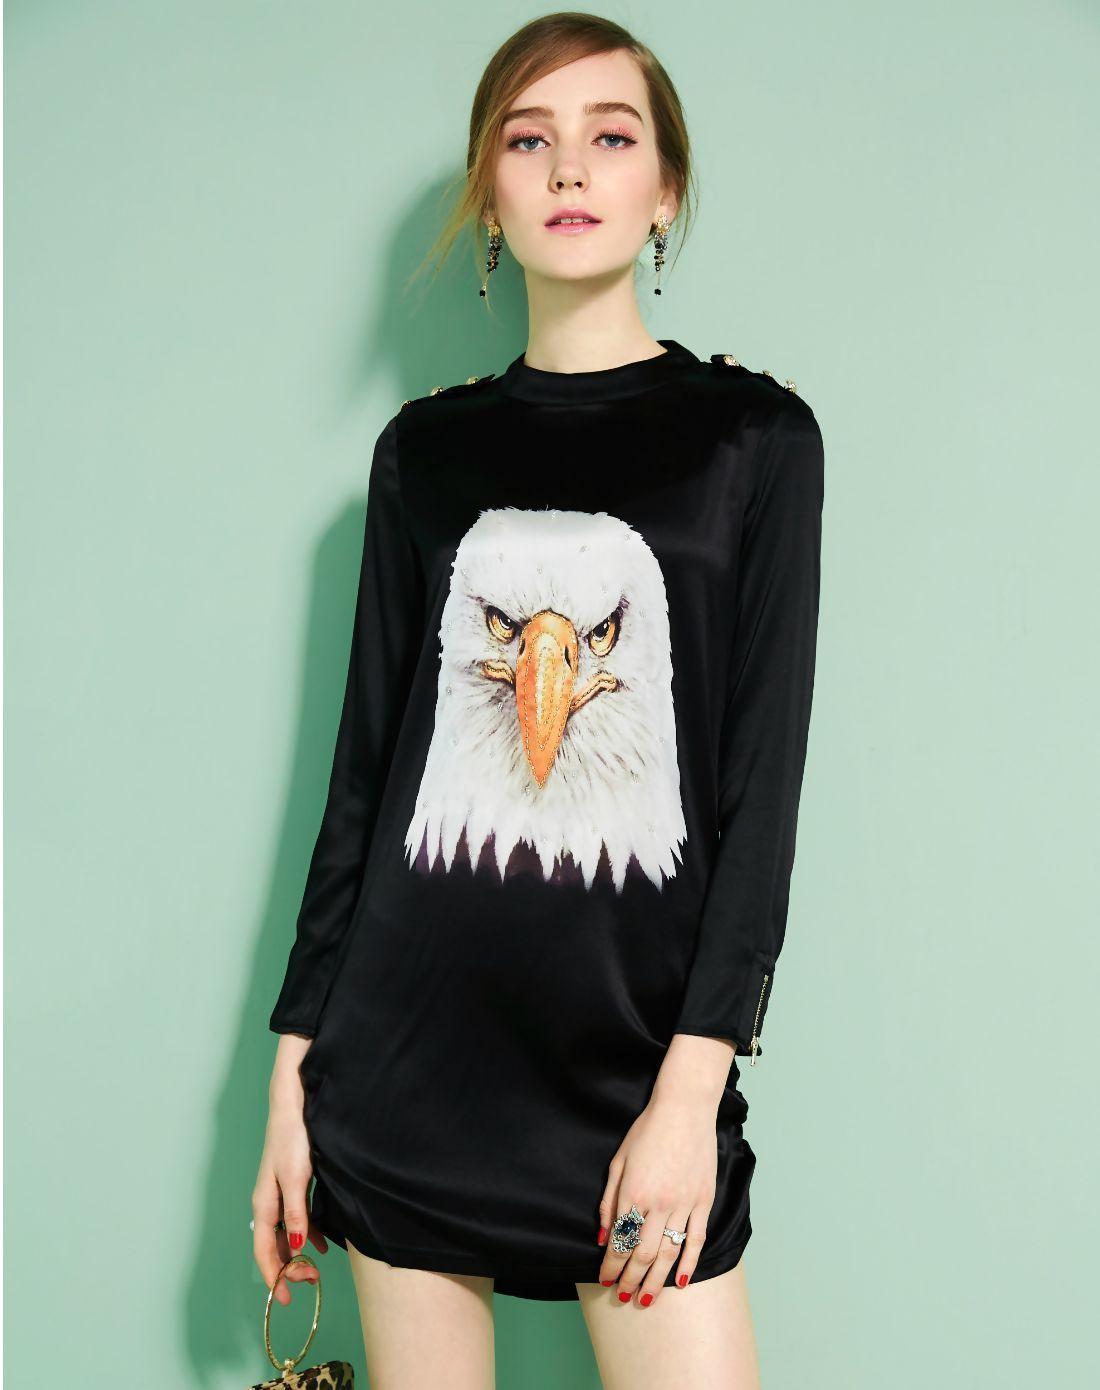 Adorewe vipme designer shift dresses designer afondi black animal